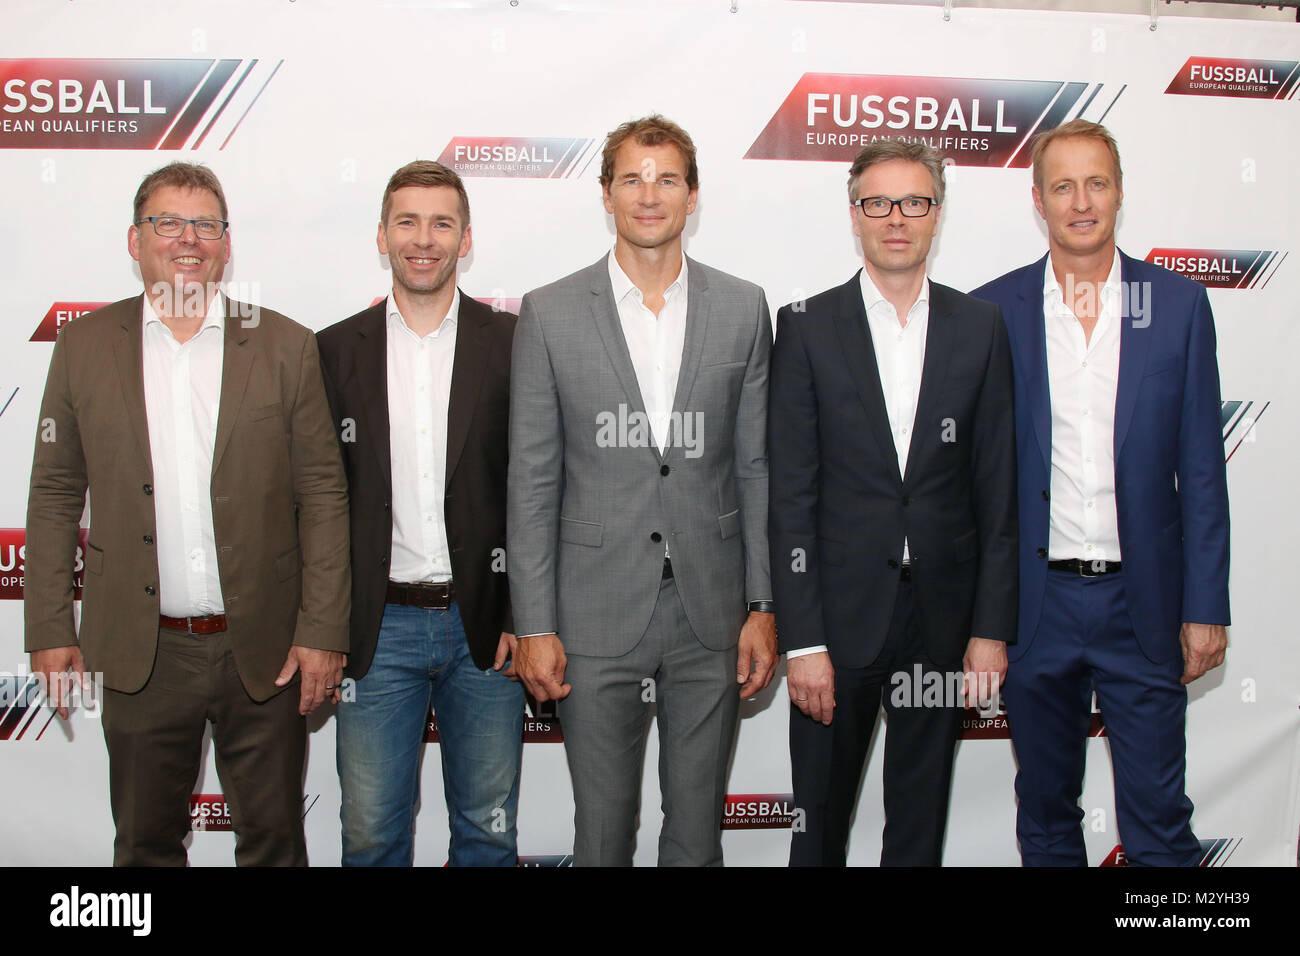 Jens Lehmann (RTL Fussball Experte, European Qualifiers), Florian Koenig (Moderator, European Qualifiers), Marco Stock Photo